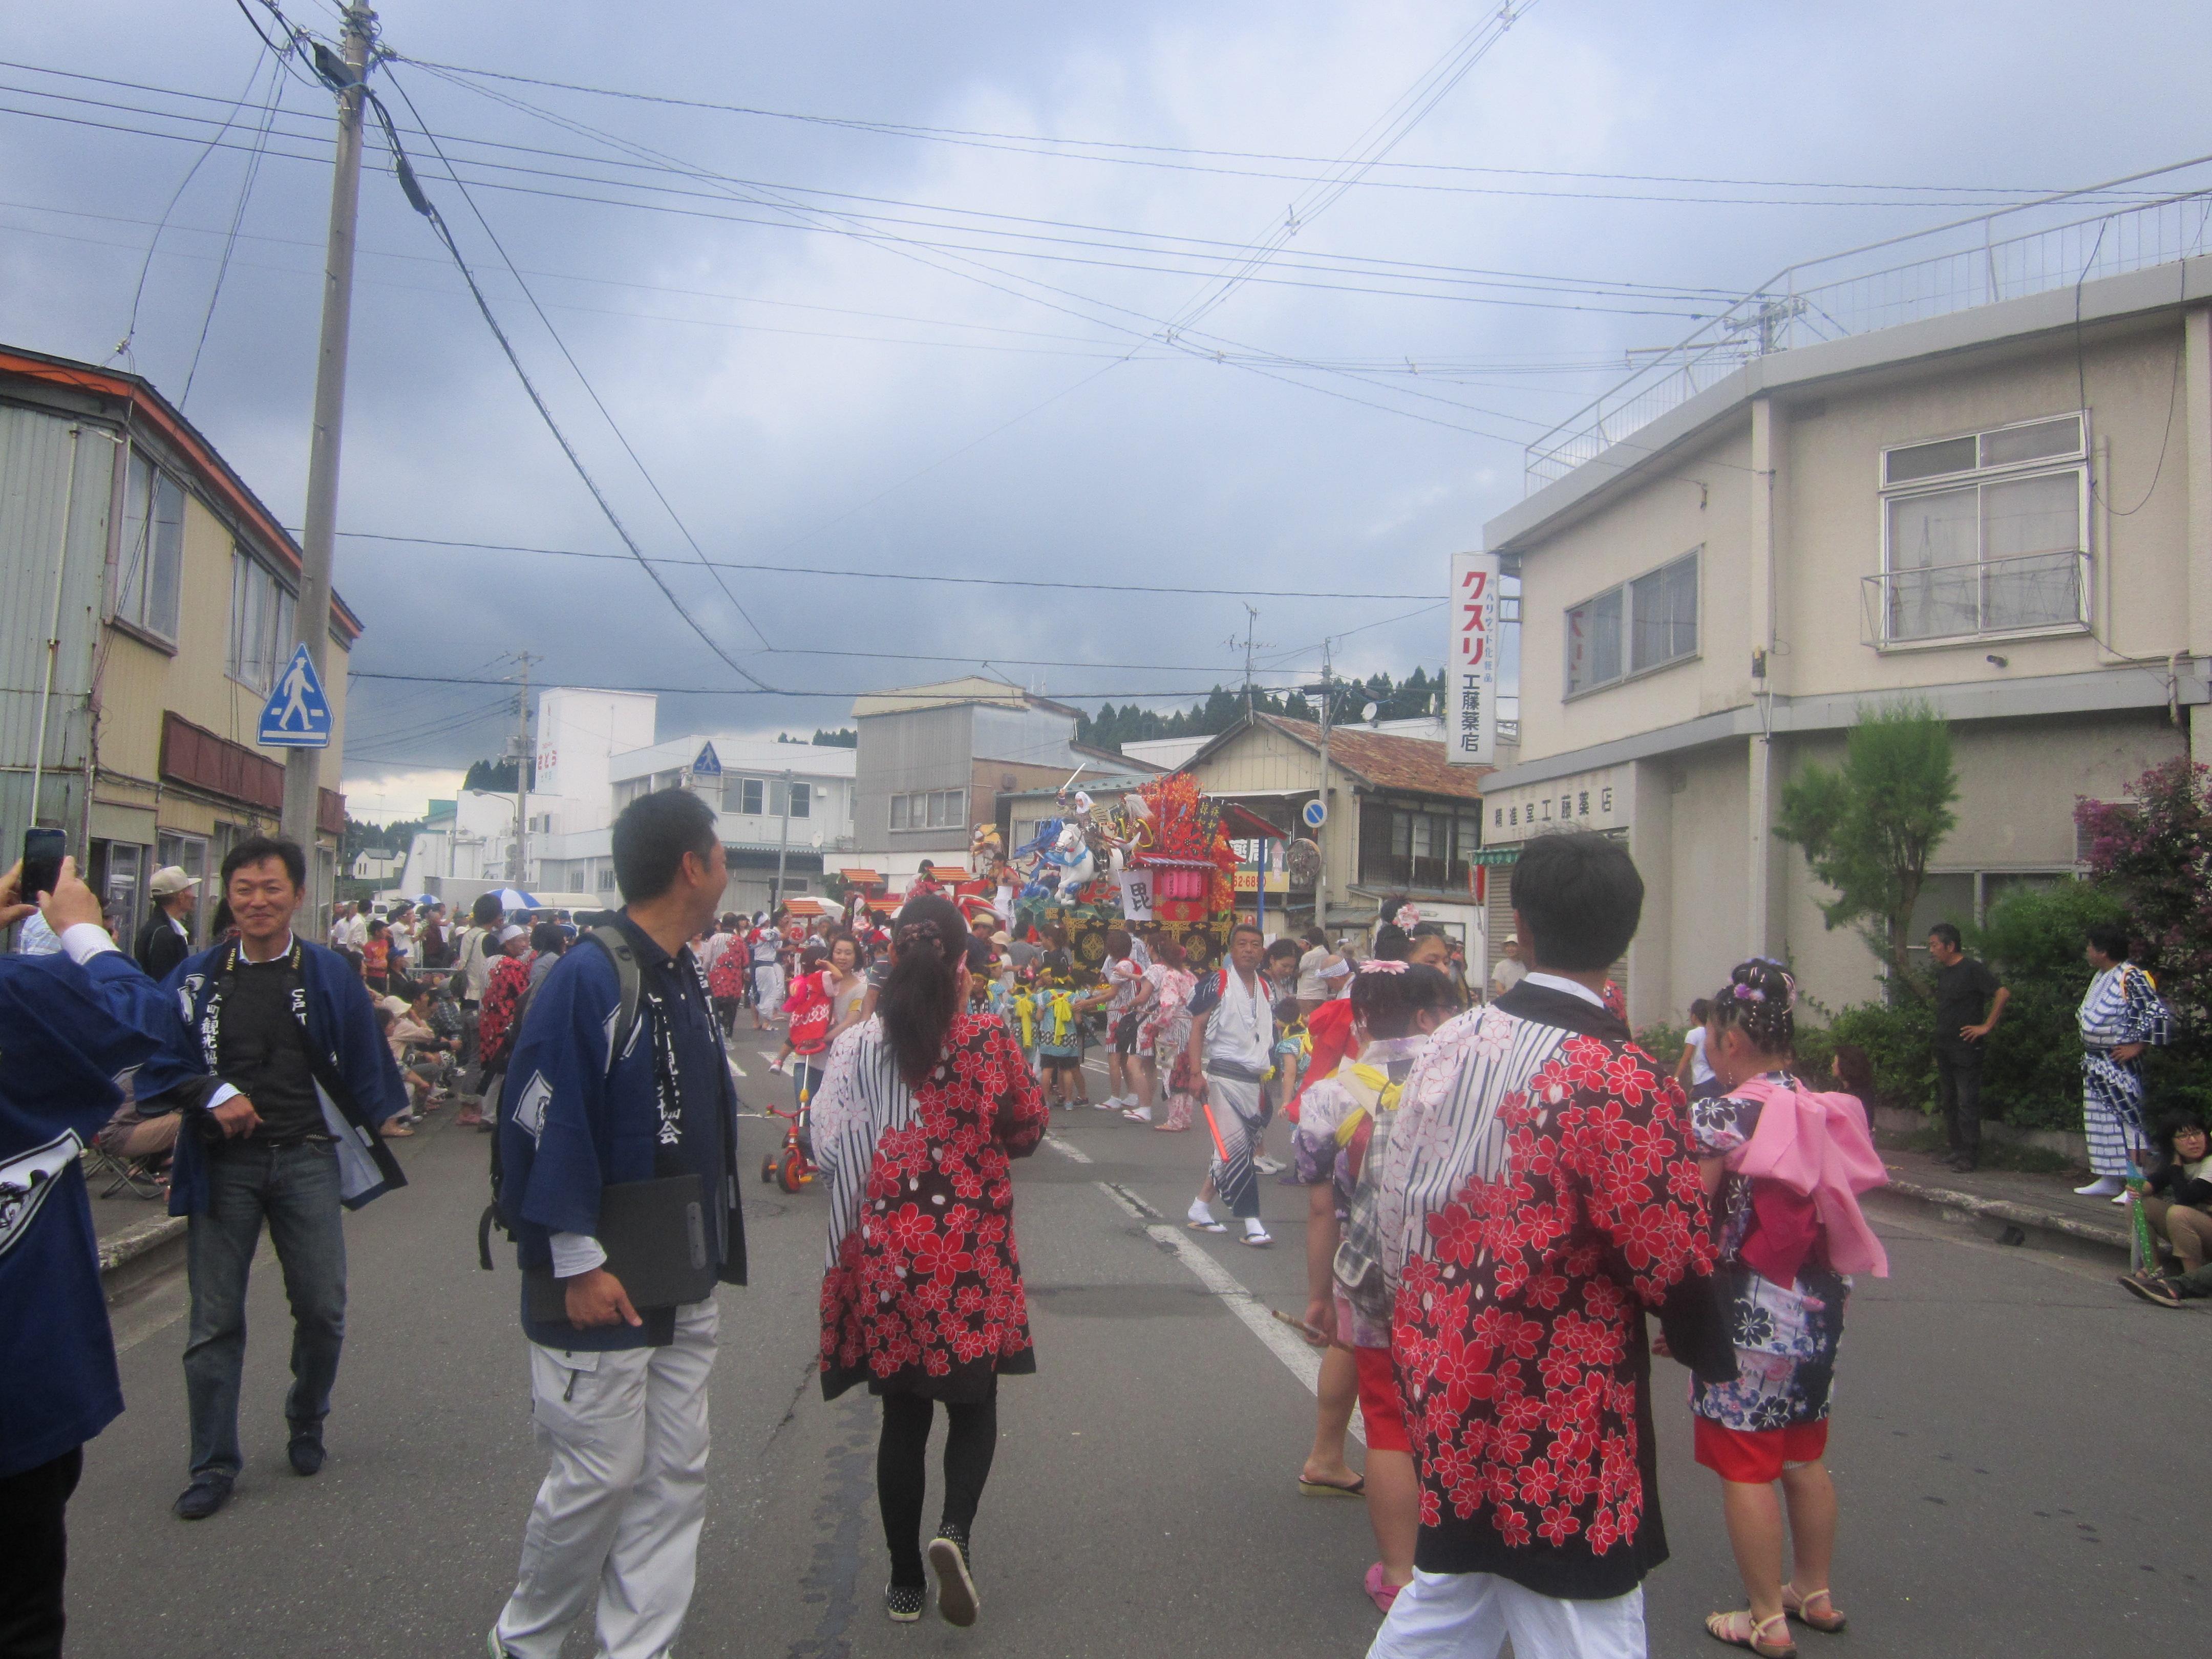 IMG 4255 - 麻布十番納涼祭り25,26日(七戸町出店)